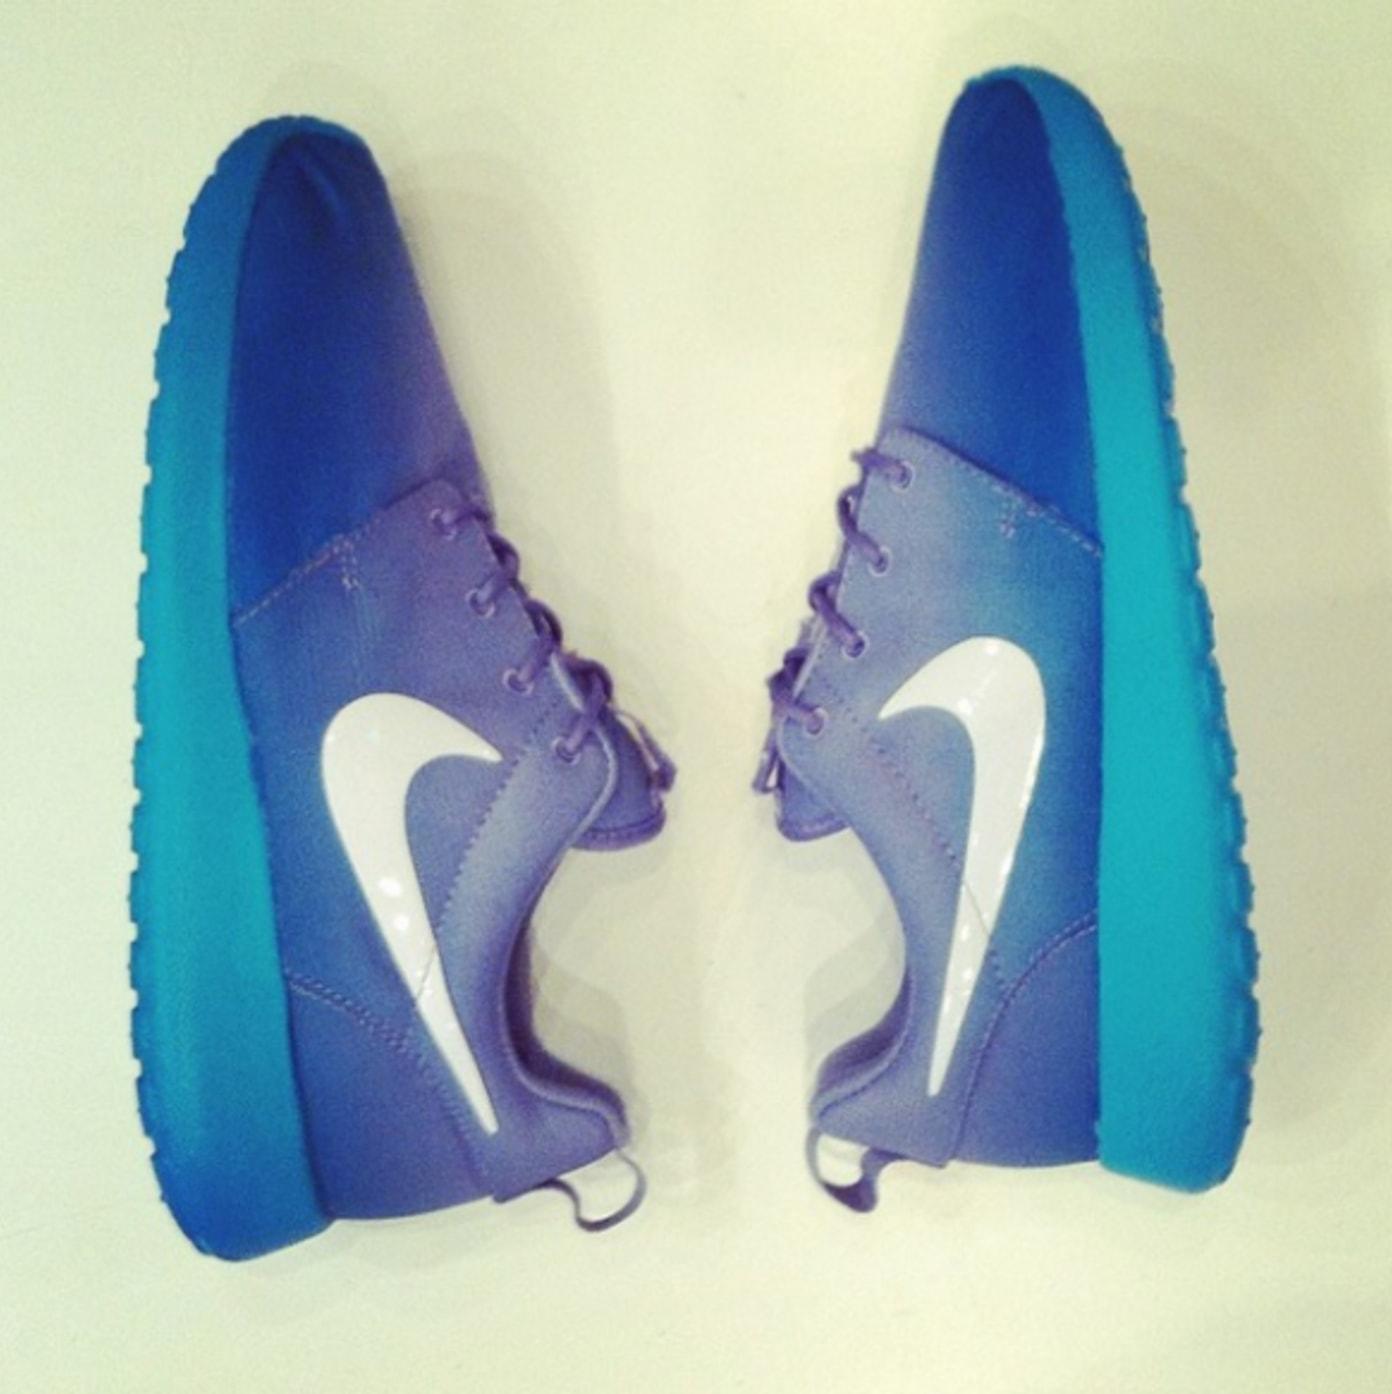 New Nike Roshe Run Styles Available at Shelflife